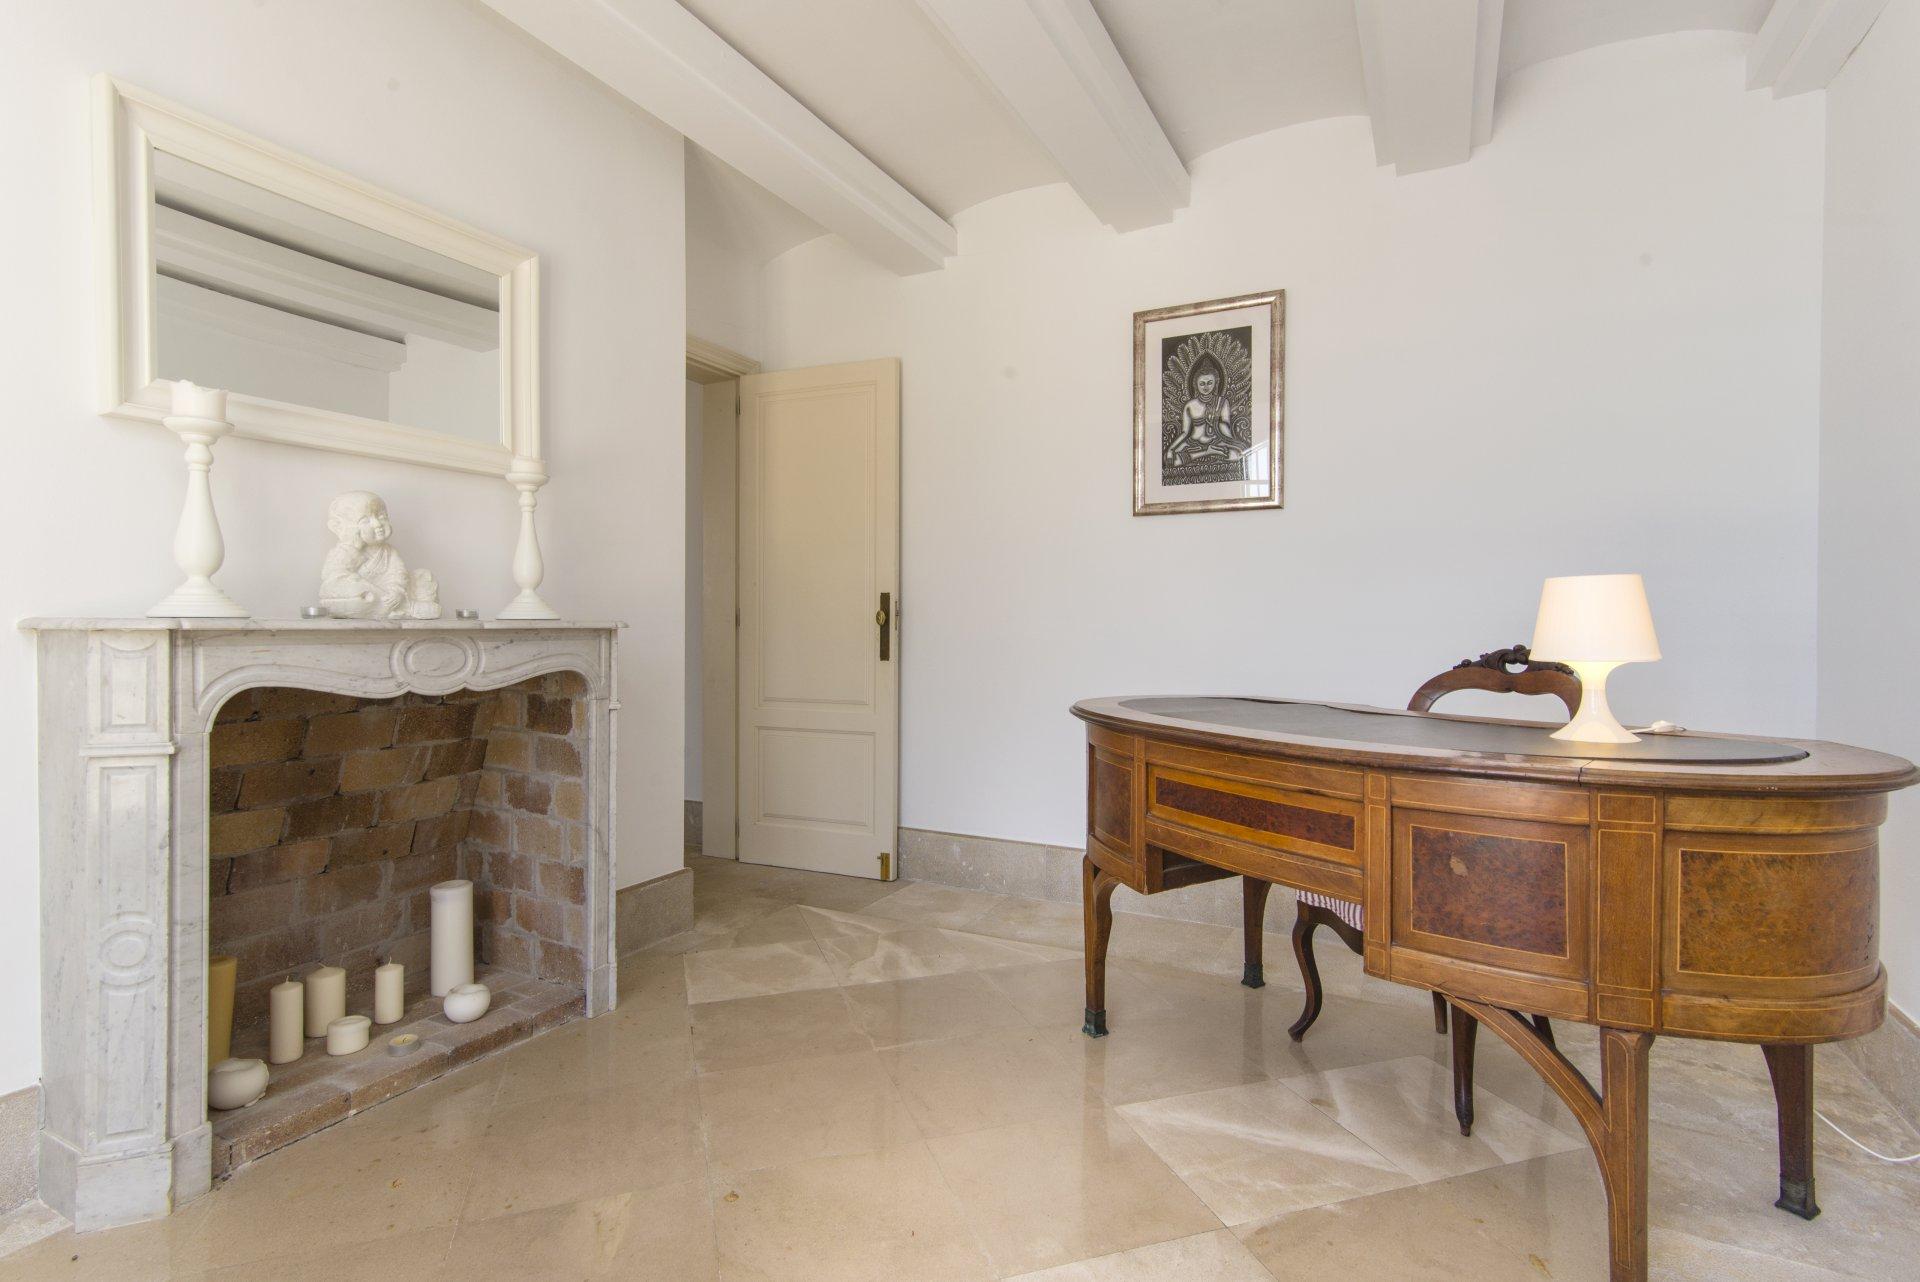 Anzeige Verkauf Haus Palma de Mallorca Genova (07001)   John Taylor